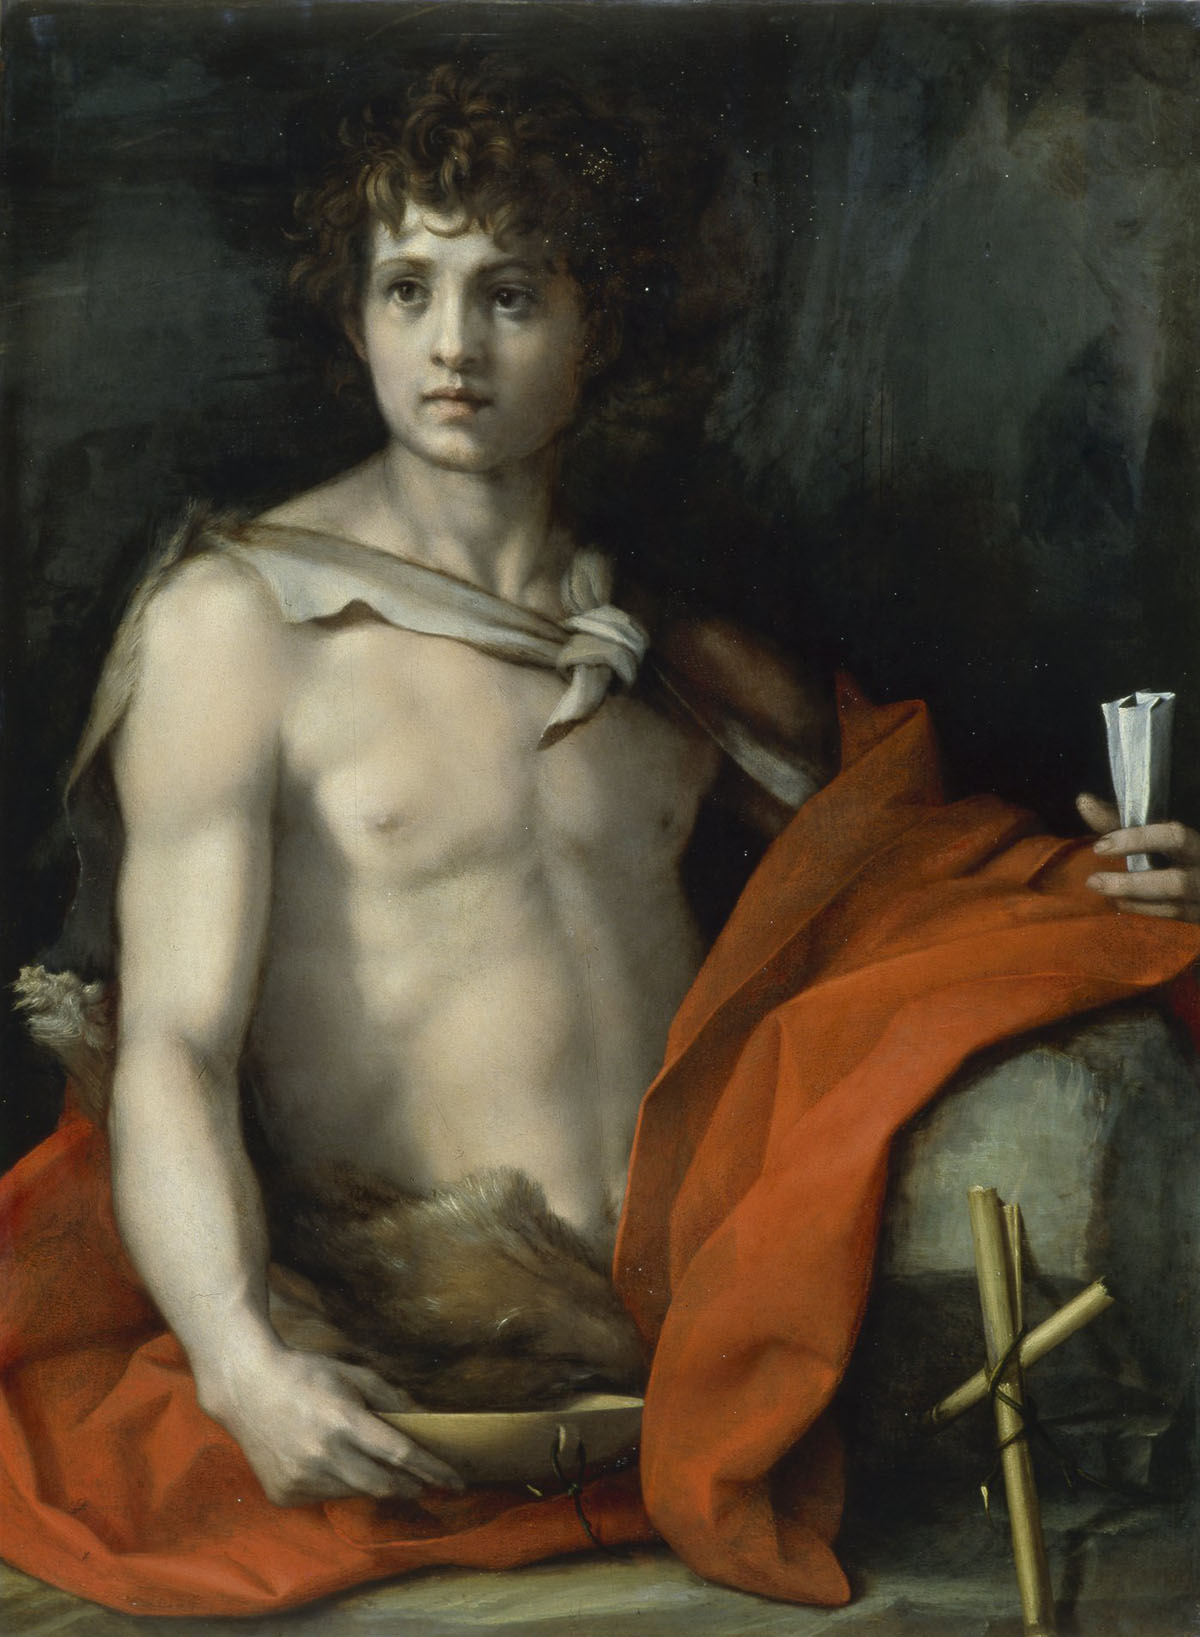 Andrea del Sarto, Saint John the Baptist (Palazzo Pitti, Florence)